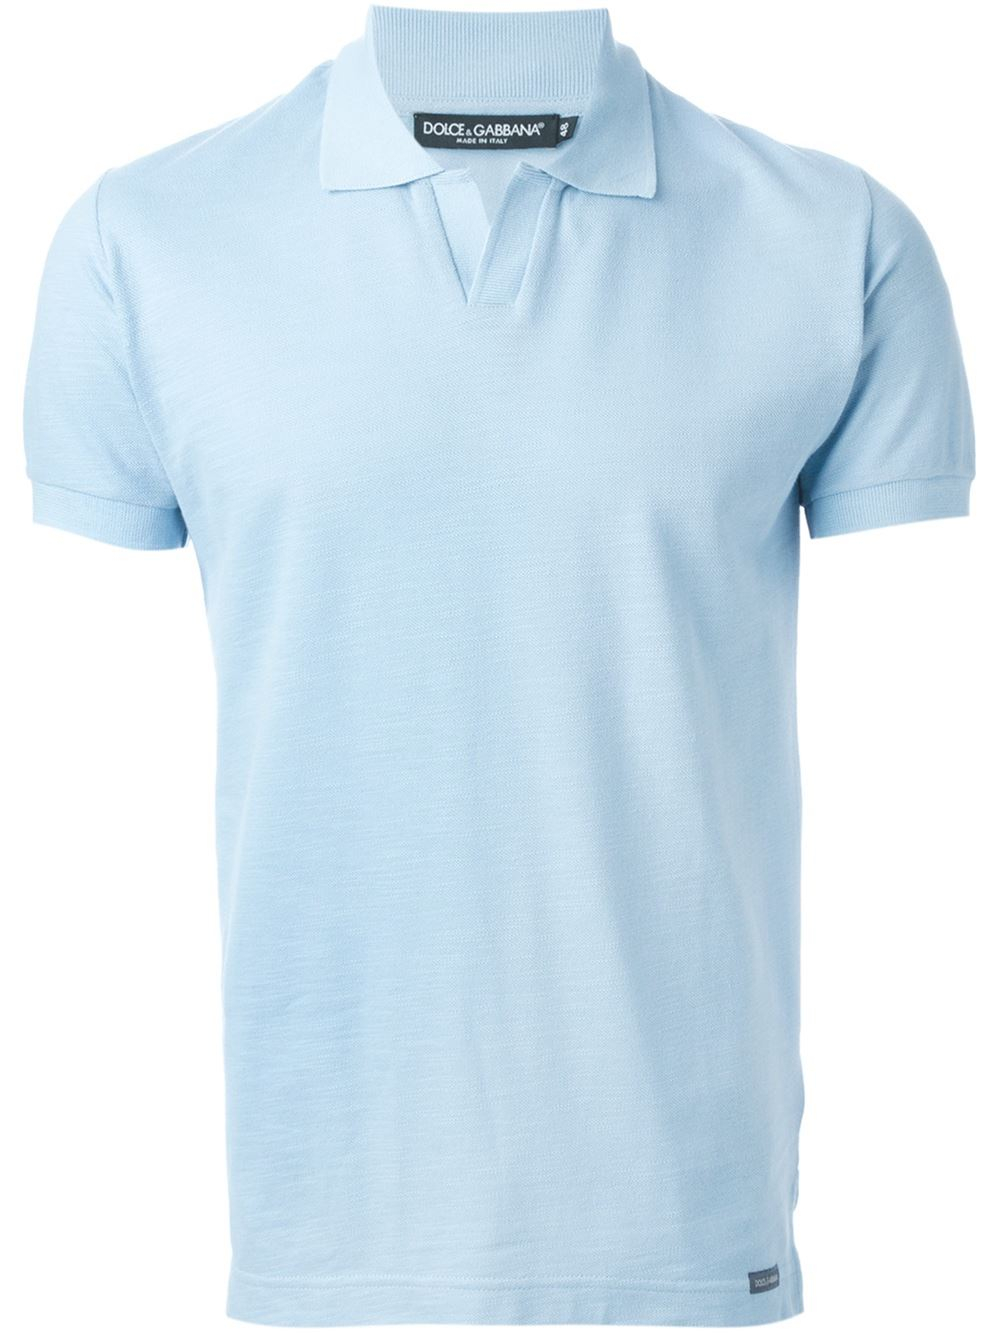 Dolce gabbana v neck cotton polo shirt in blue for men for Cotton polo shirts for men